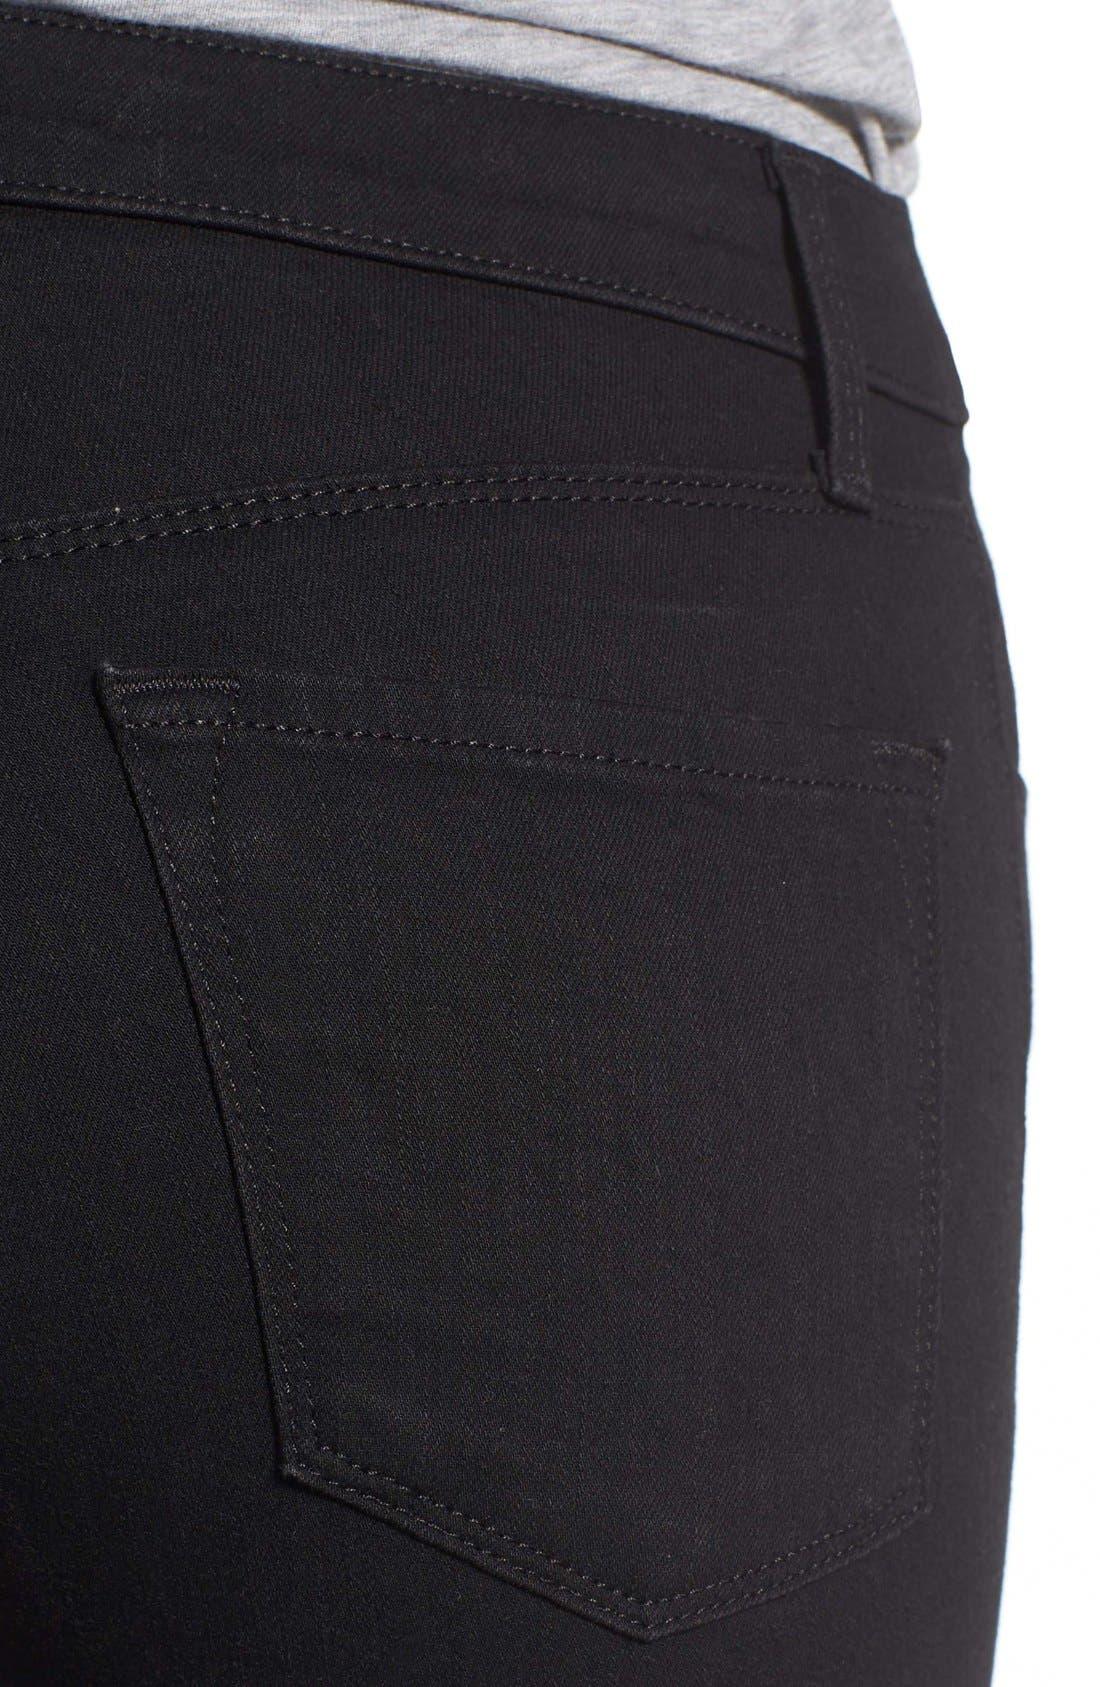 Alana High Waist Crop Skinny Jeans,                             Alternate thumbnail 8, color,                             002